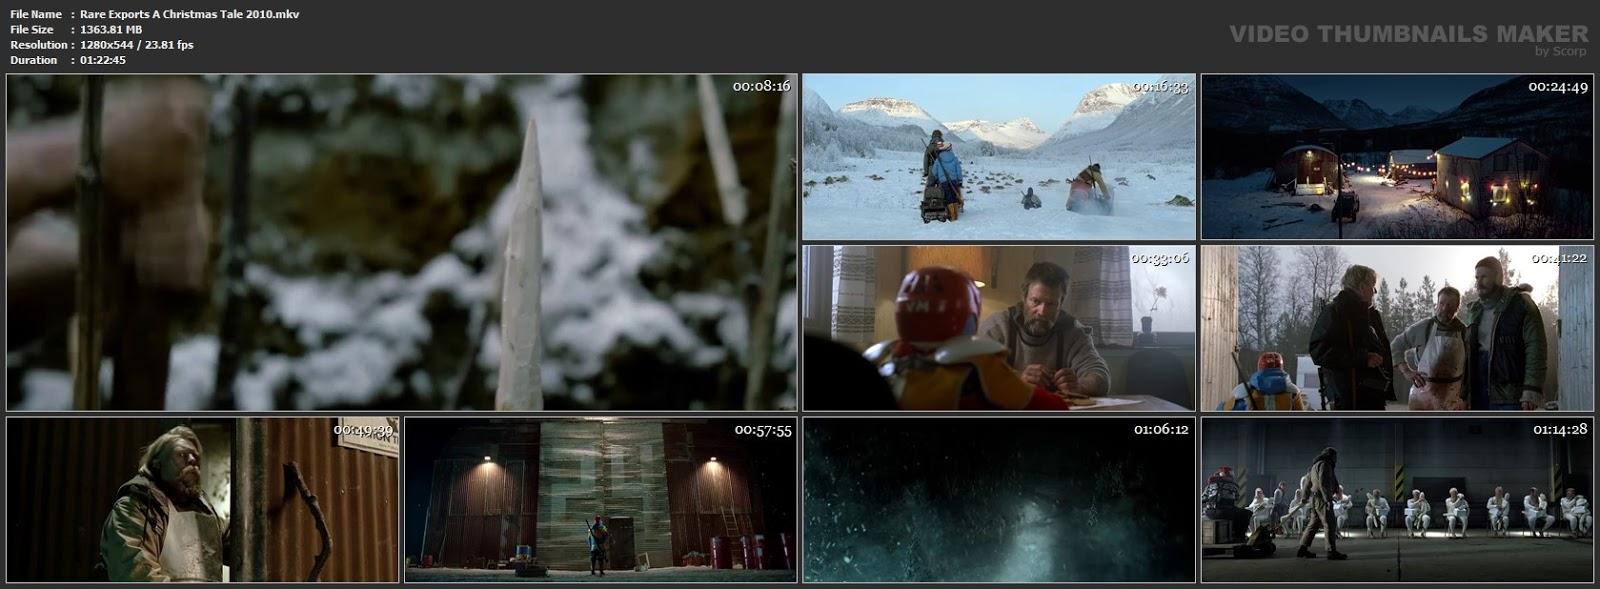 Rare exports a christmas tale 1080p torrent | Peatix